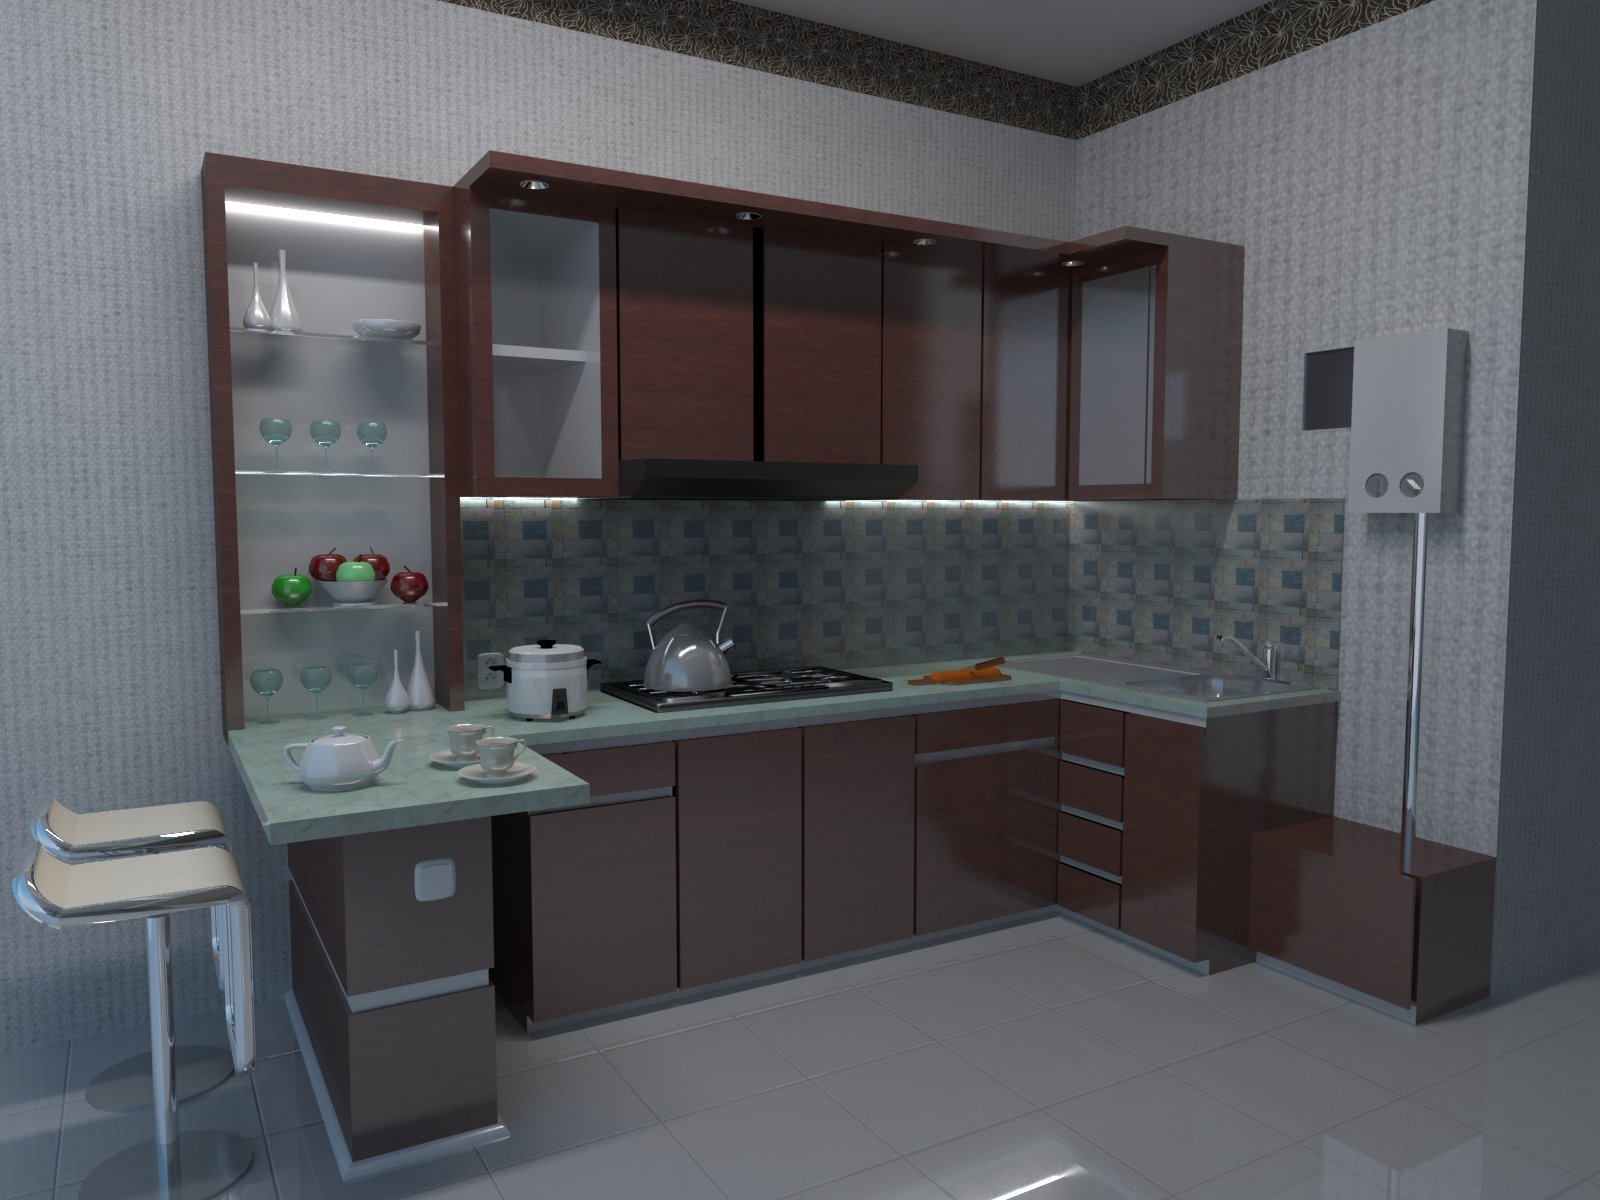 Desain kitchen set ibu iqoh yani bogor jawa for Kitchen set bogor